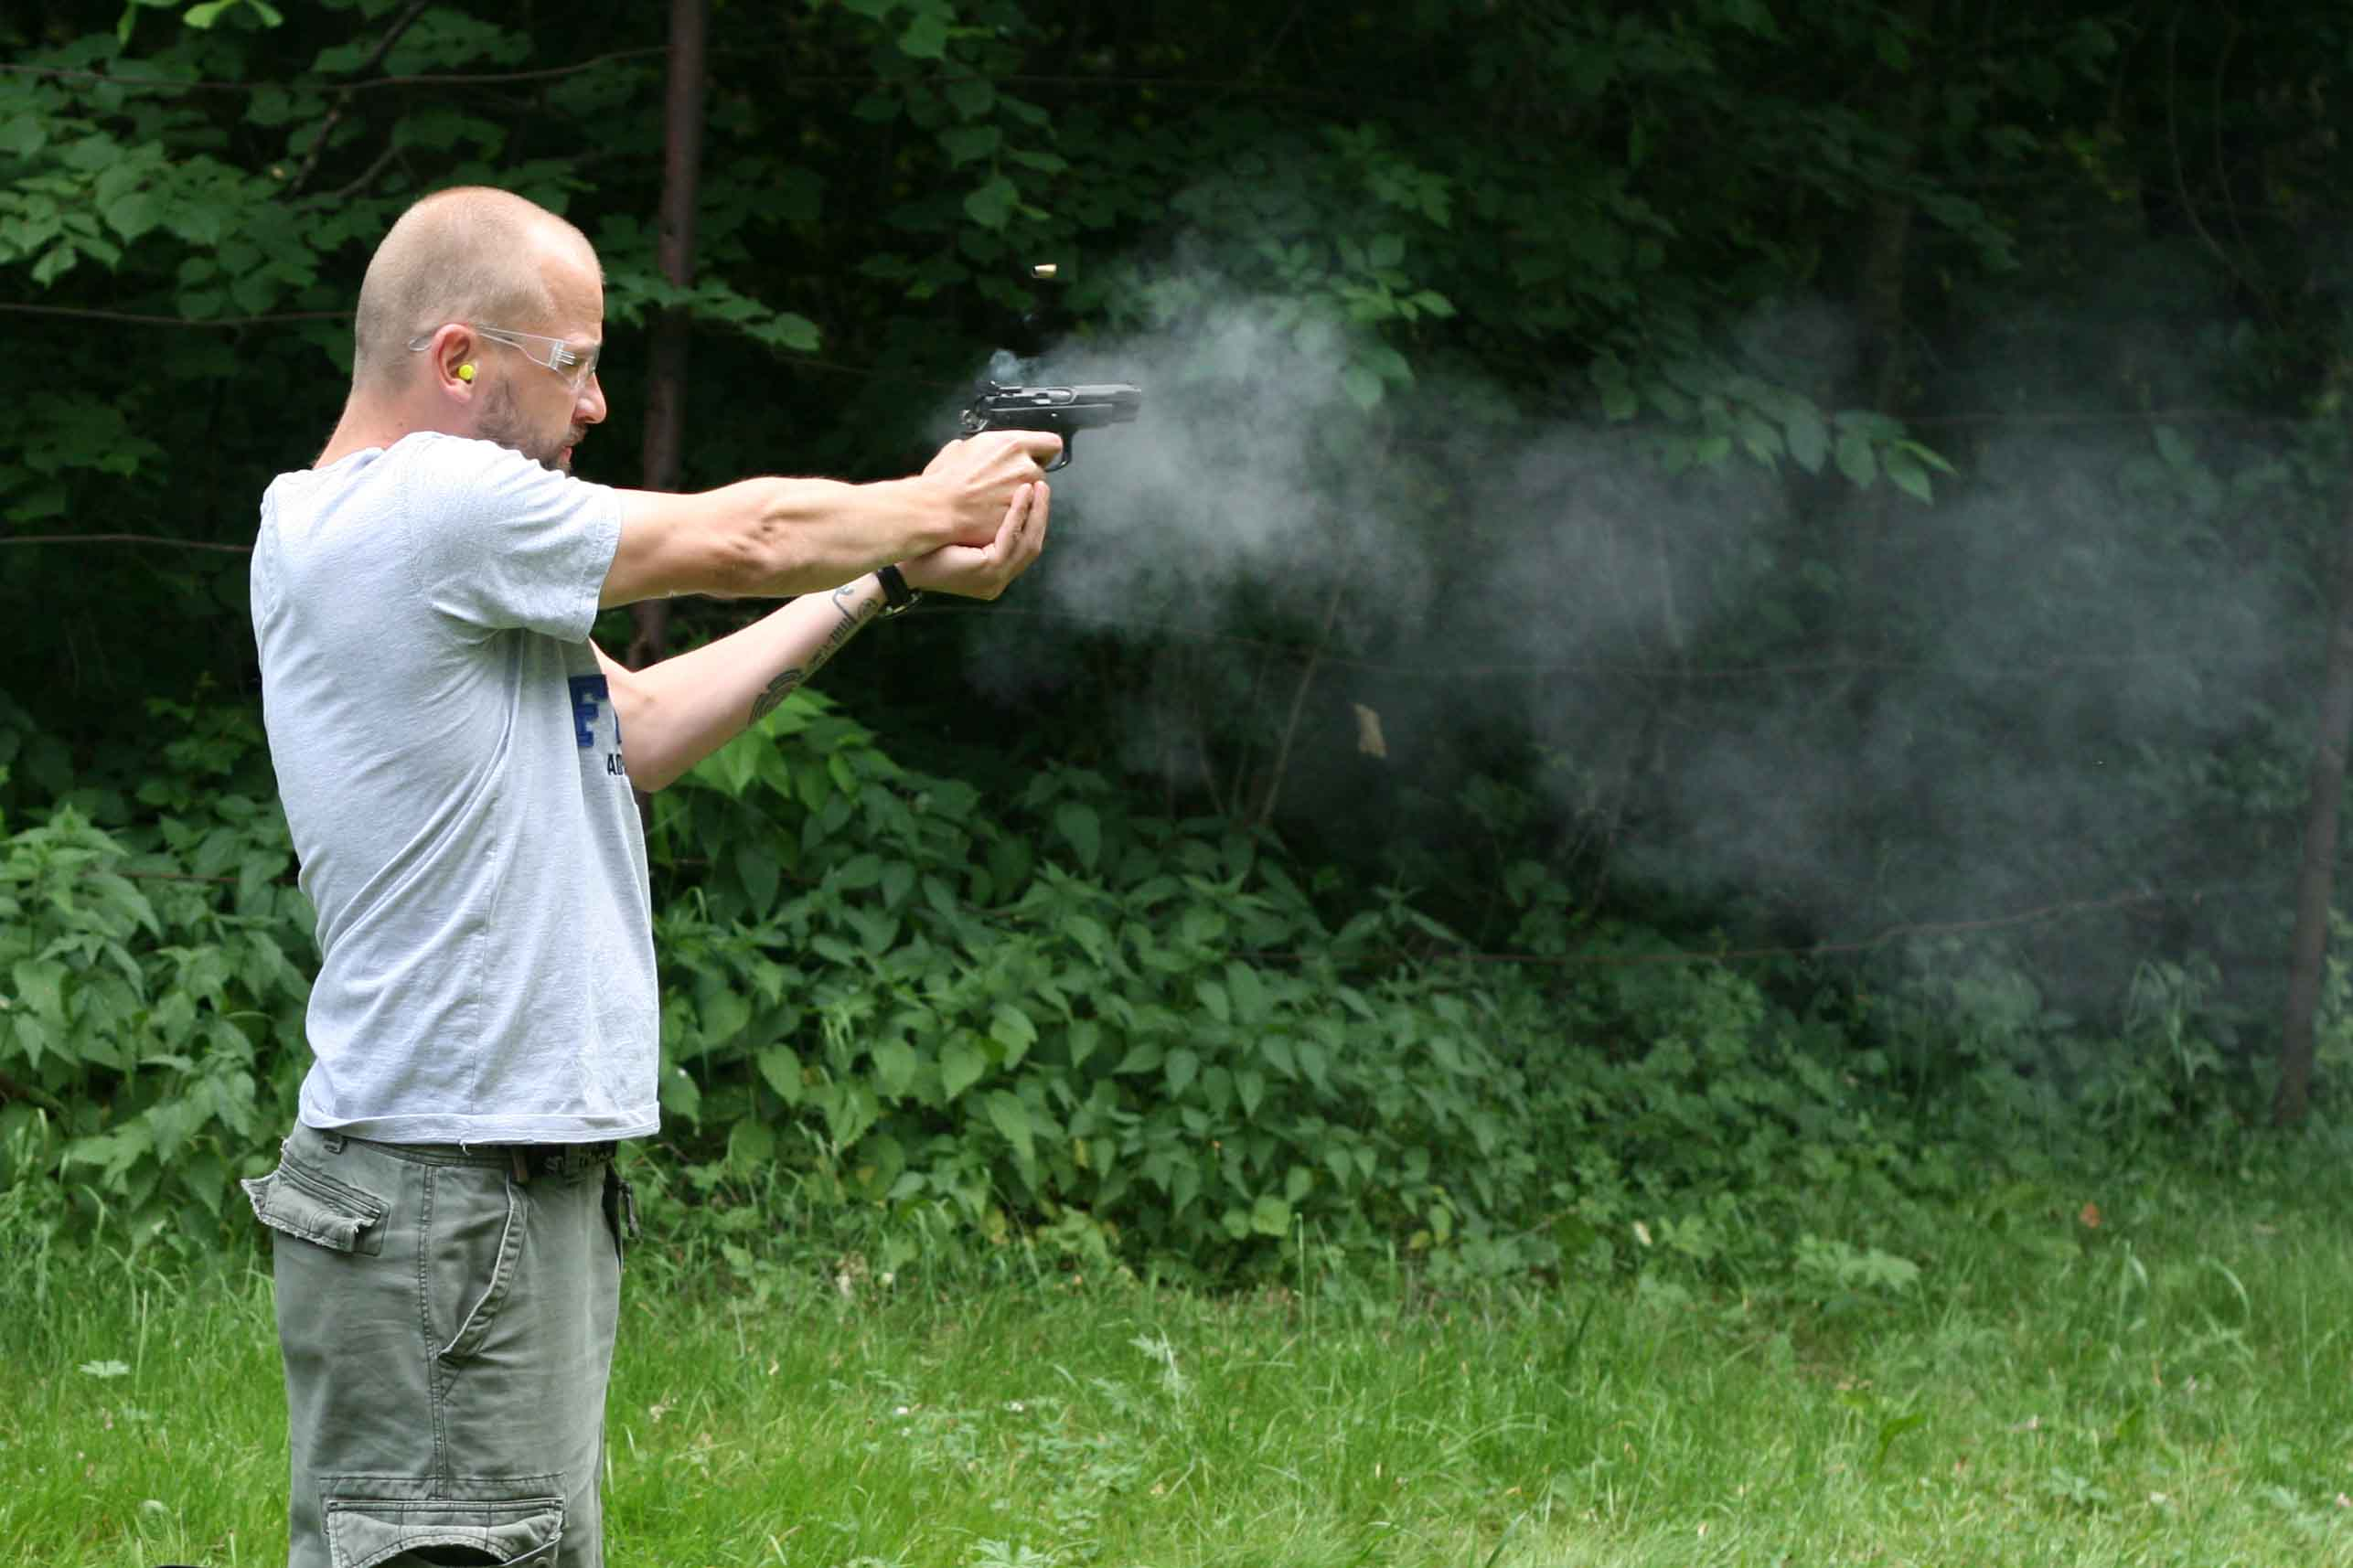 Hombre disparando en un paisaje verde